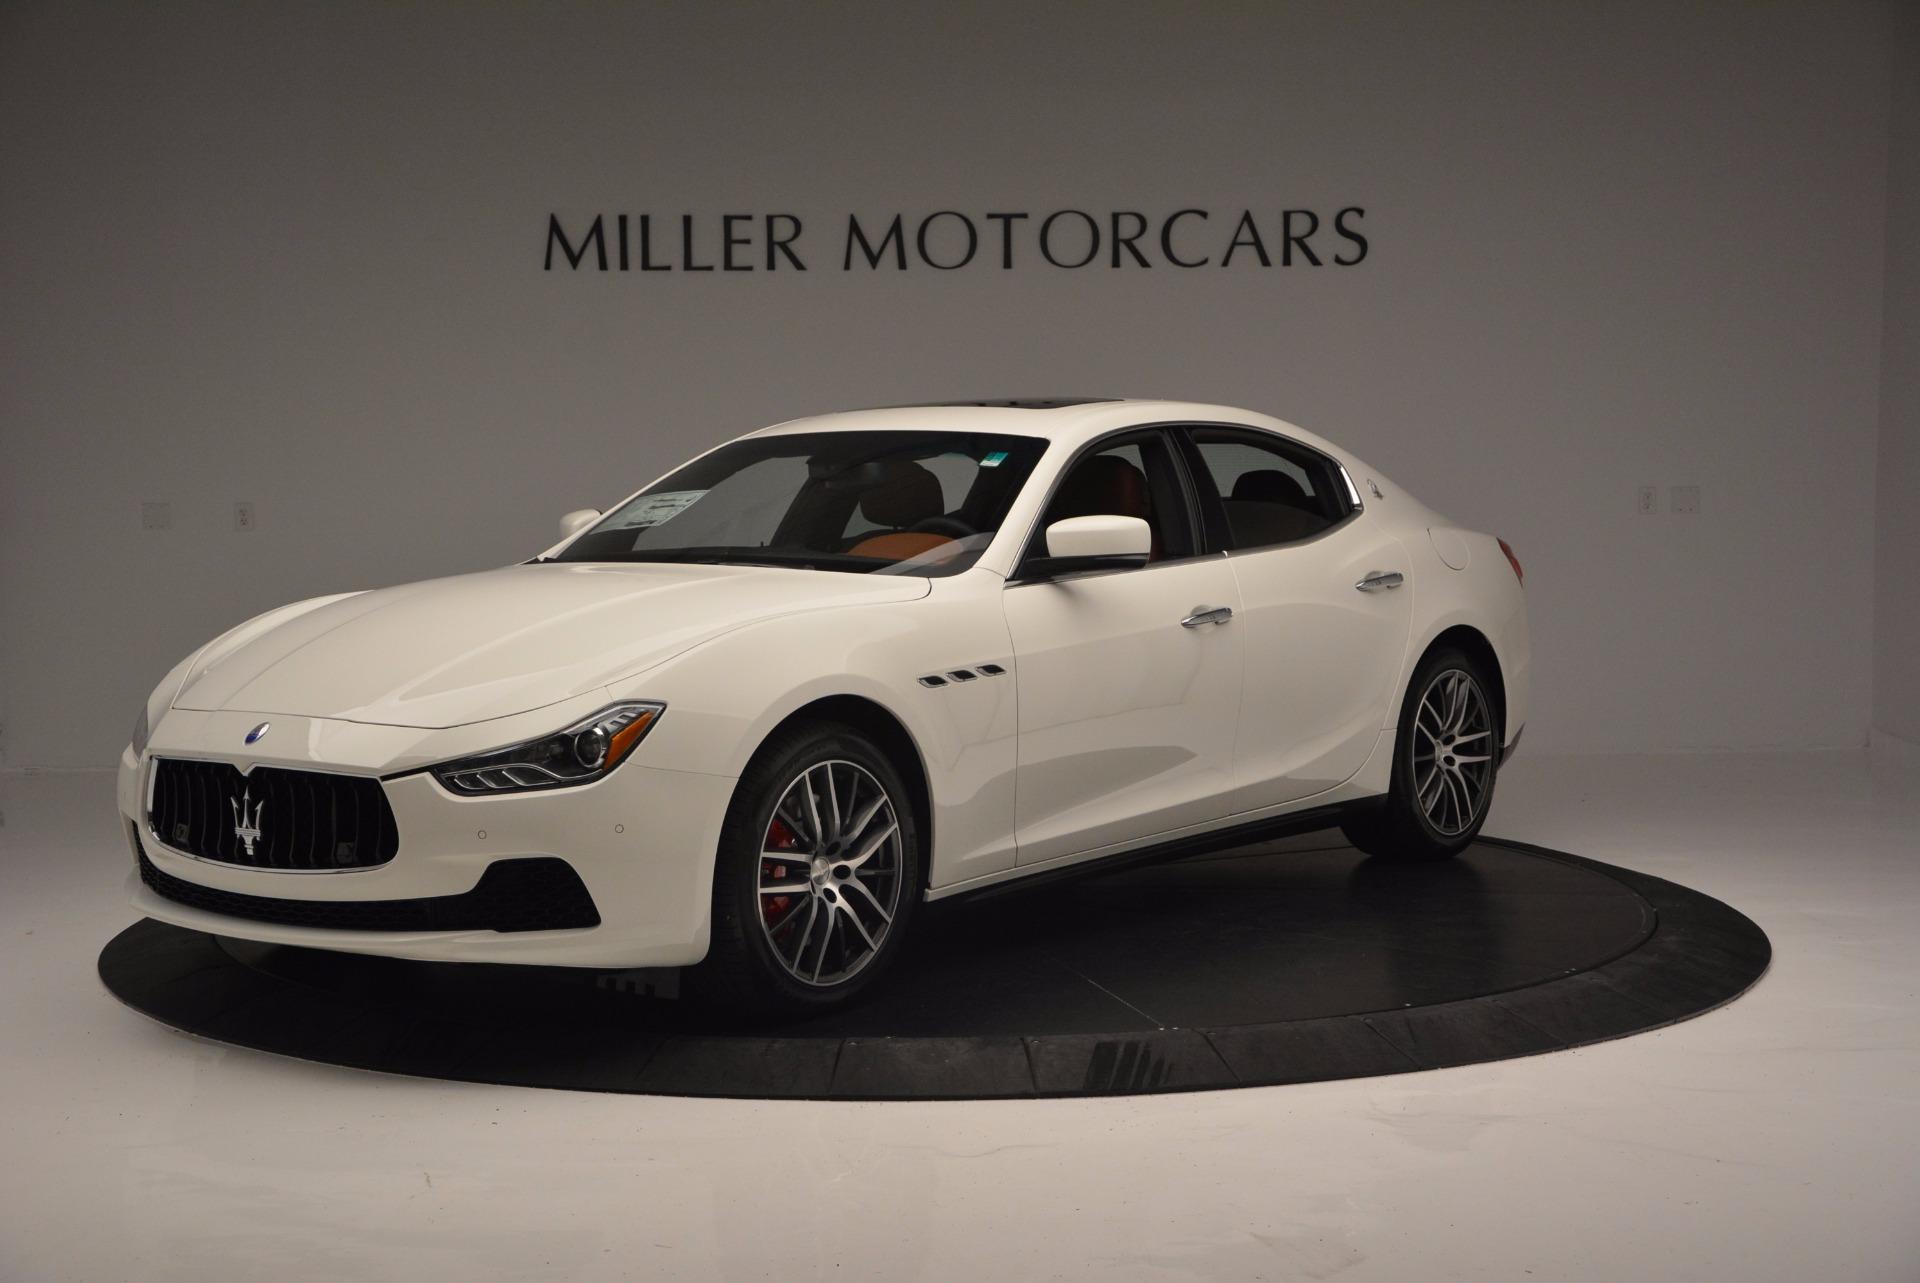 Used 2017 Maserati Ghibli S Q4 Ex-Loaner for sale Sold at Maserati of Westport in Westport CT 06880 1